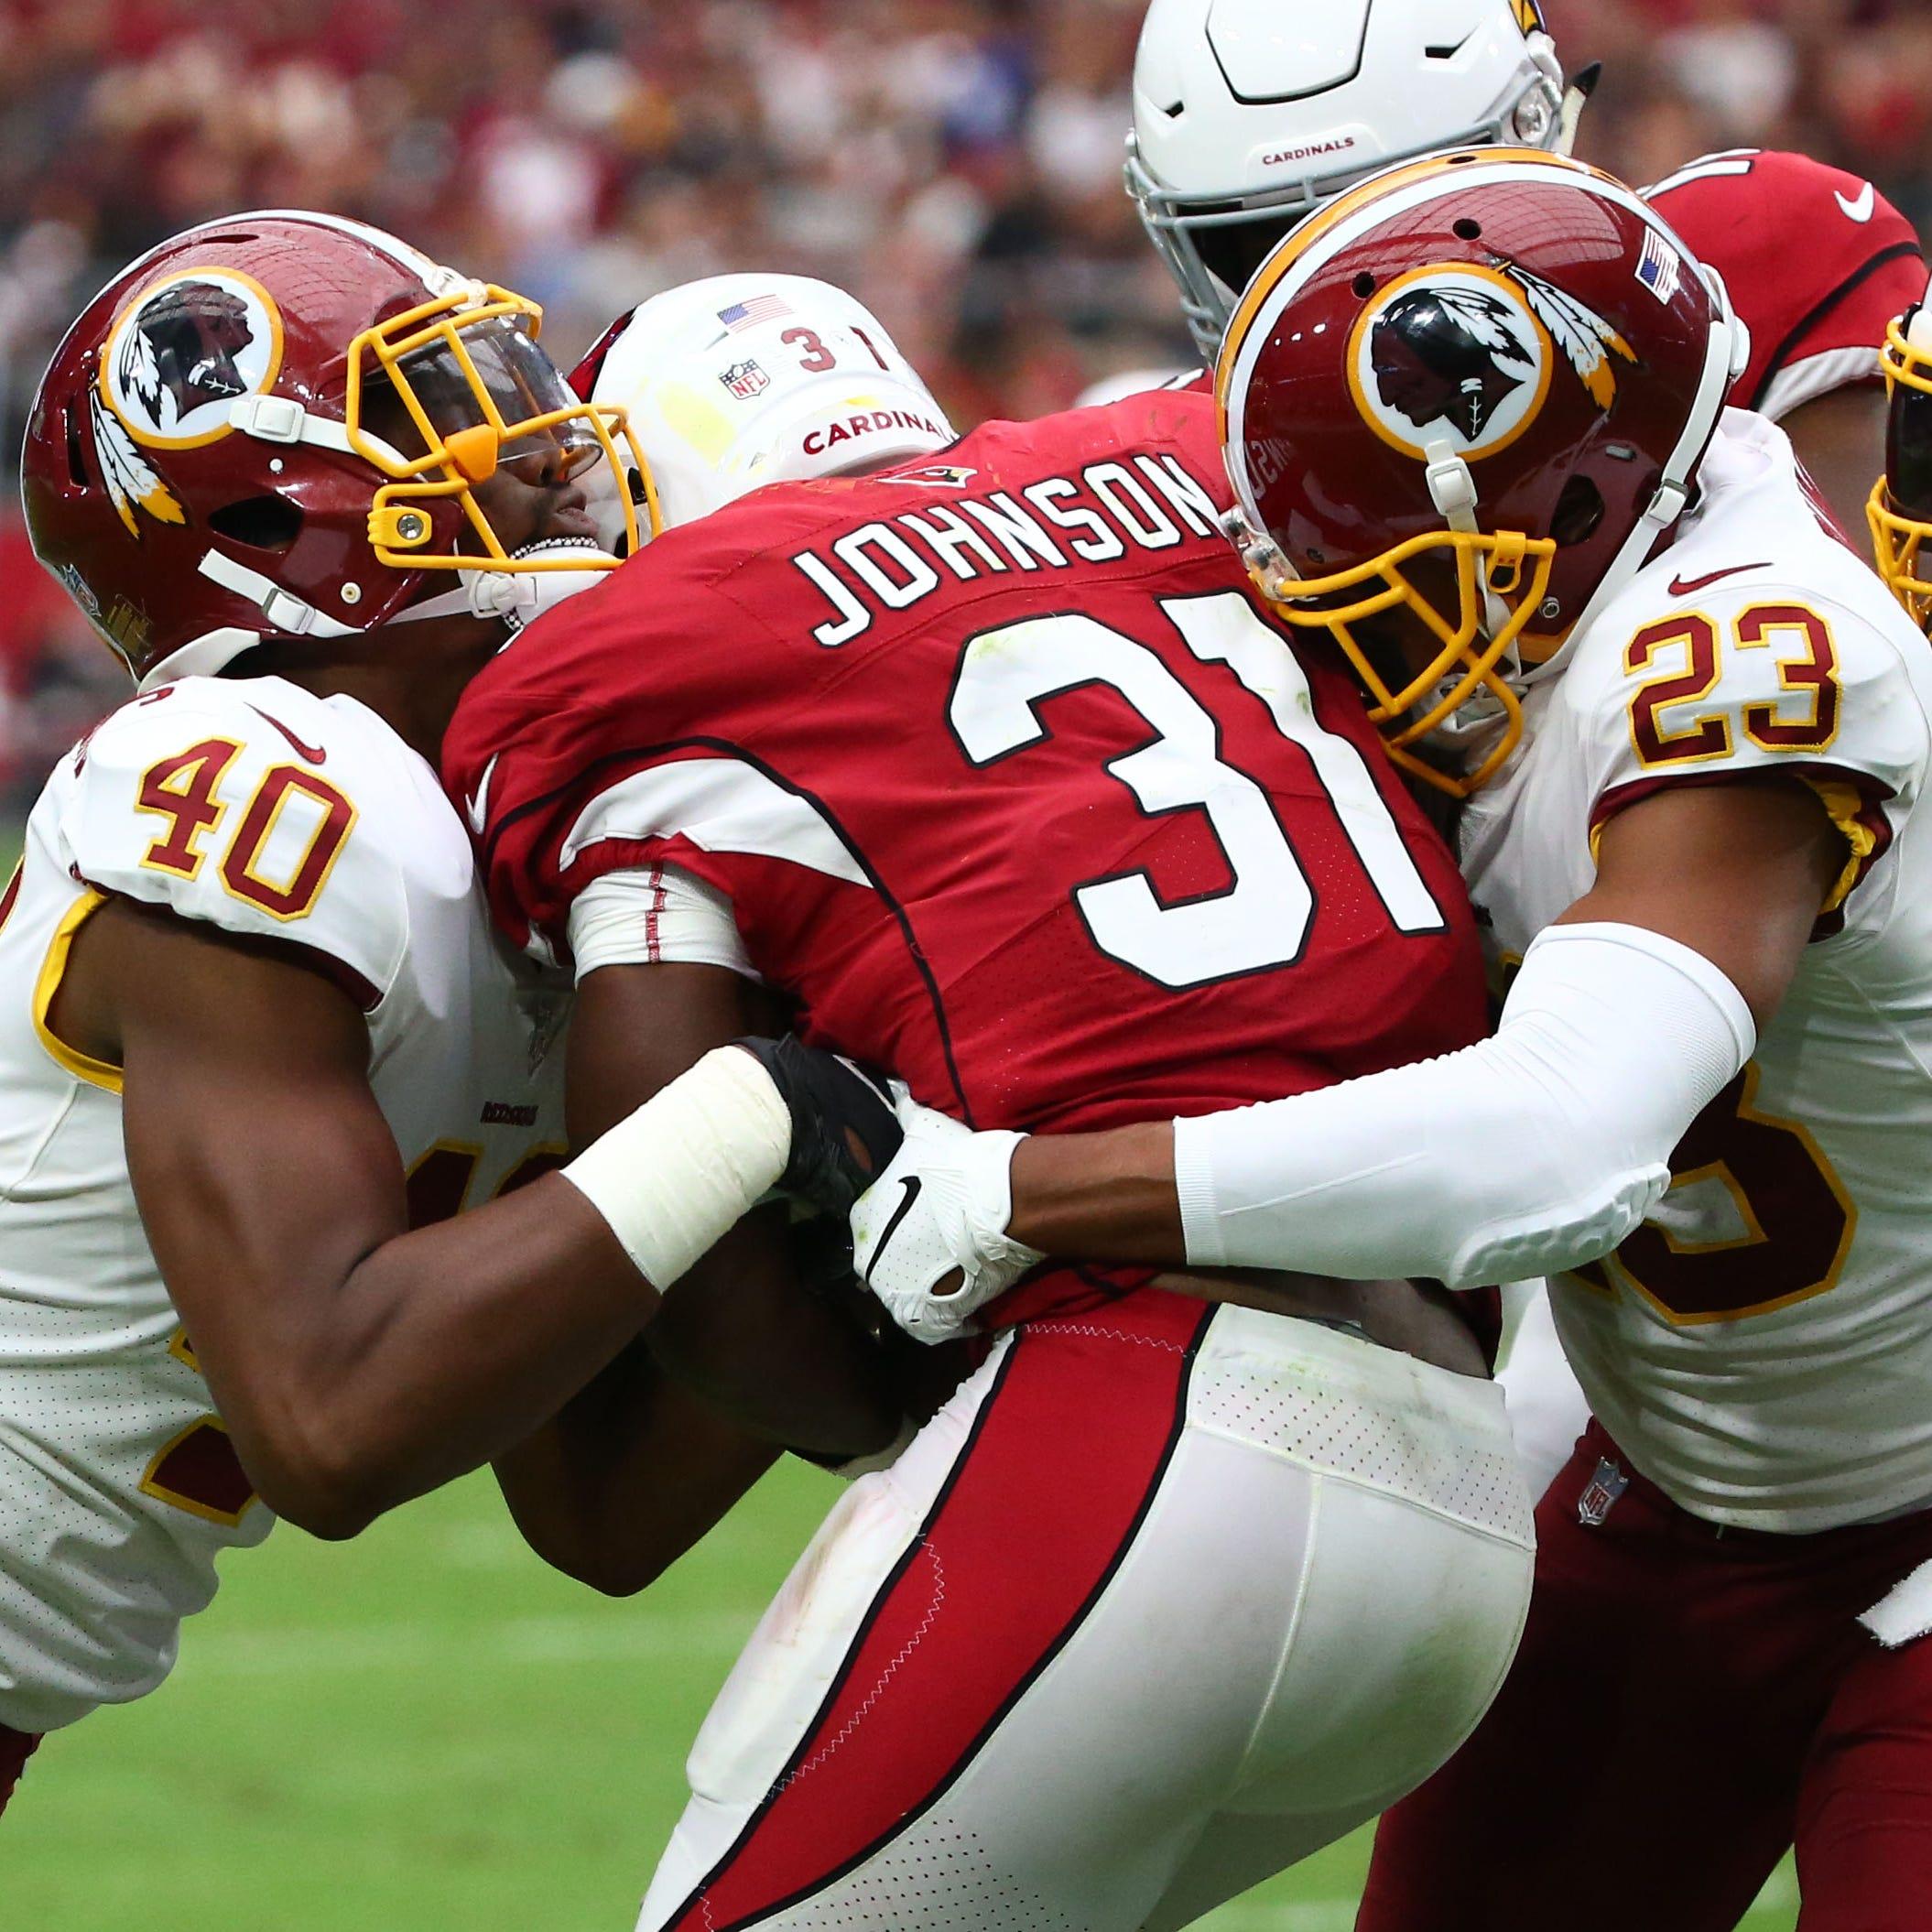 Instant replay: Arizona Cardinals dominated by Washington Redskins in season opener